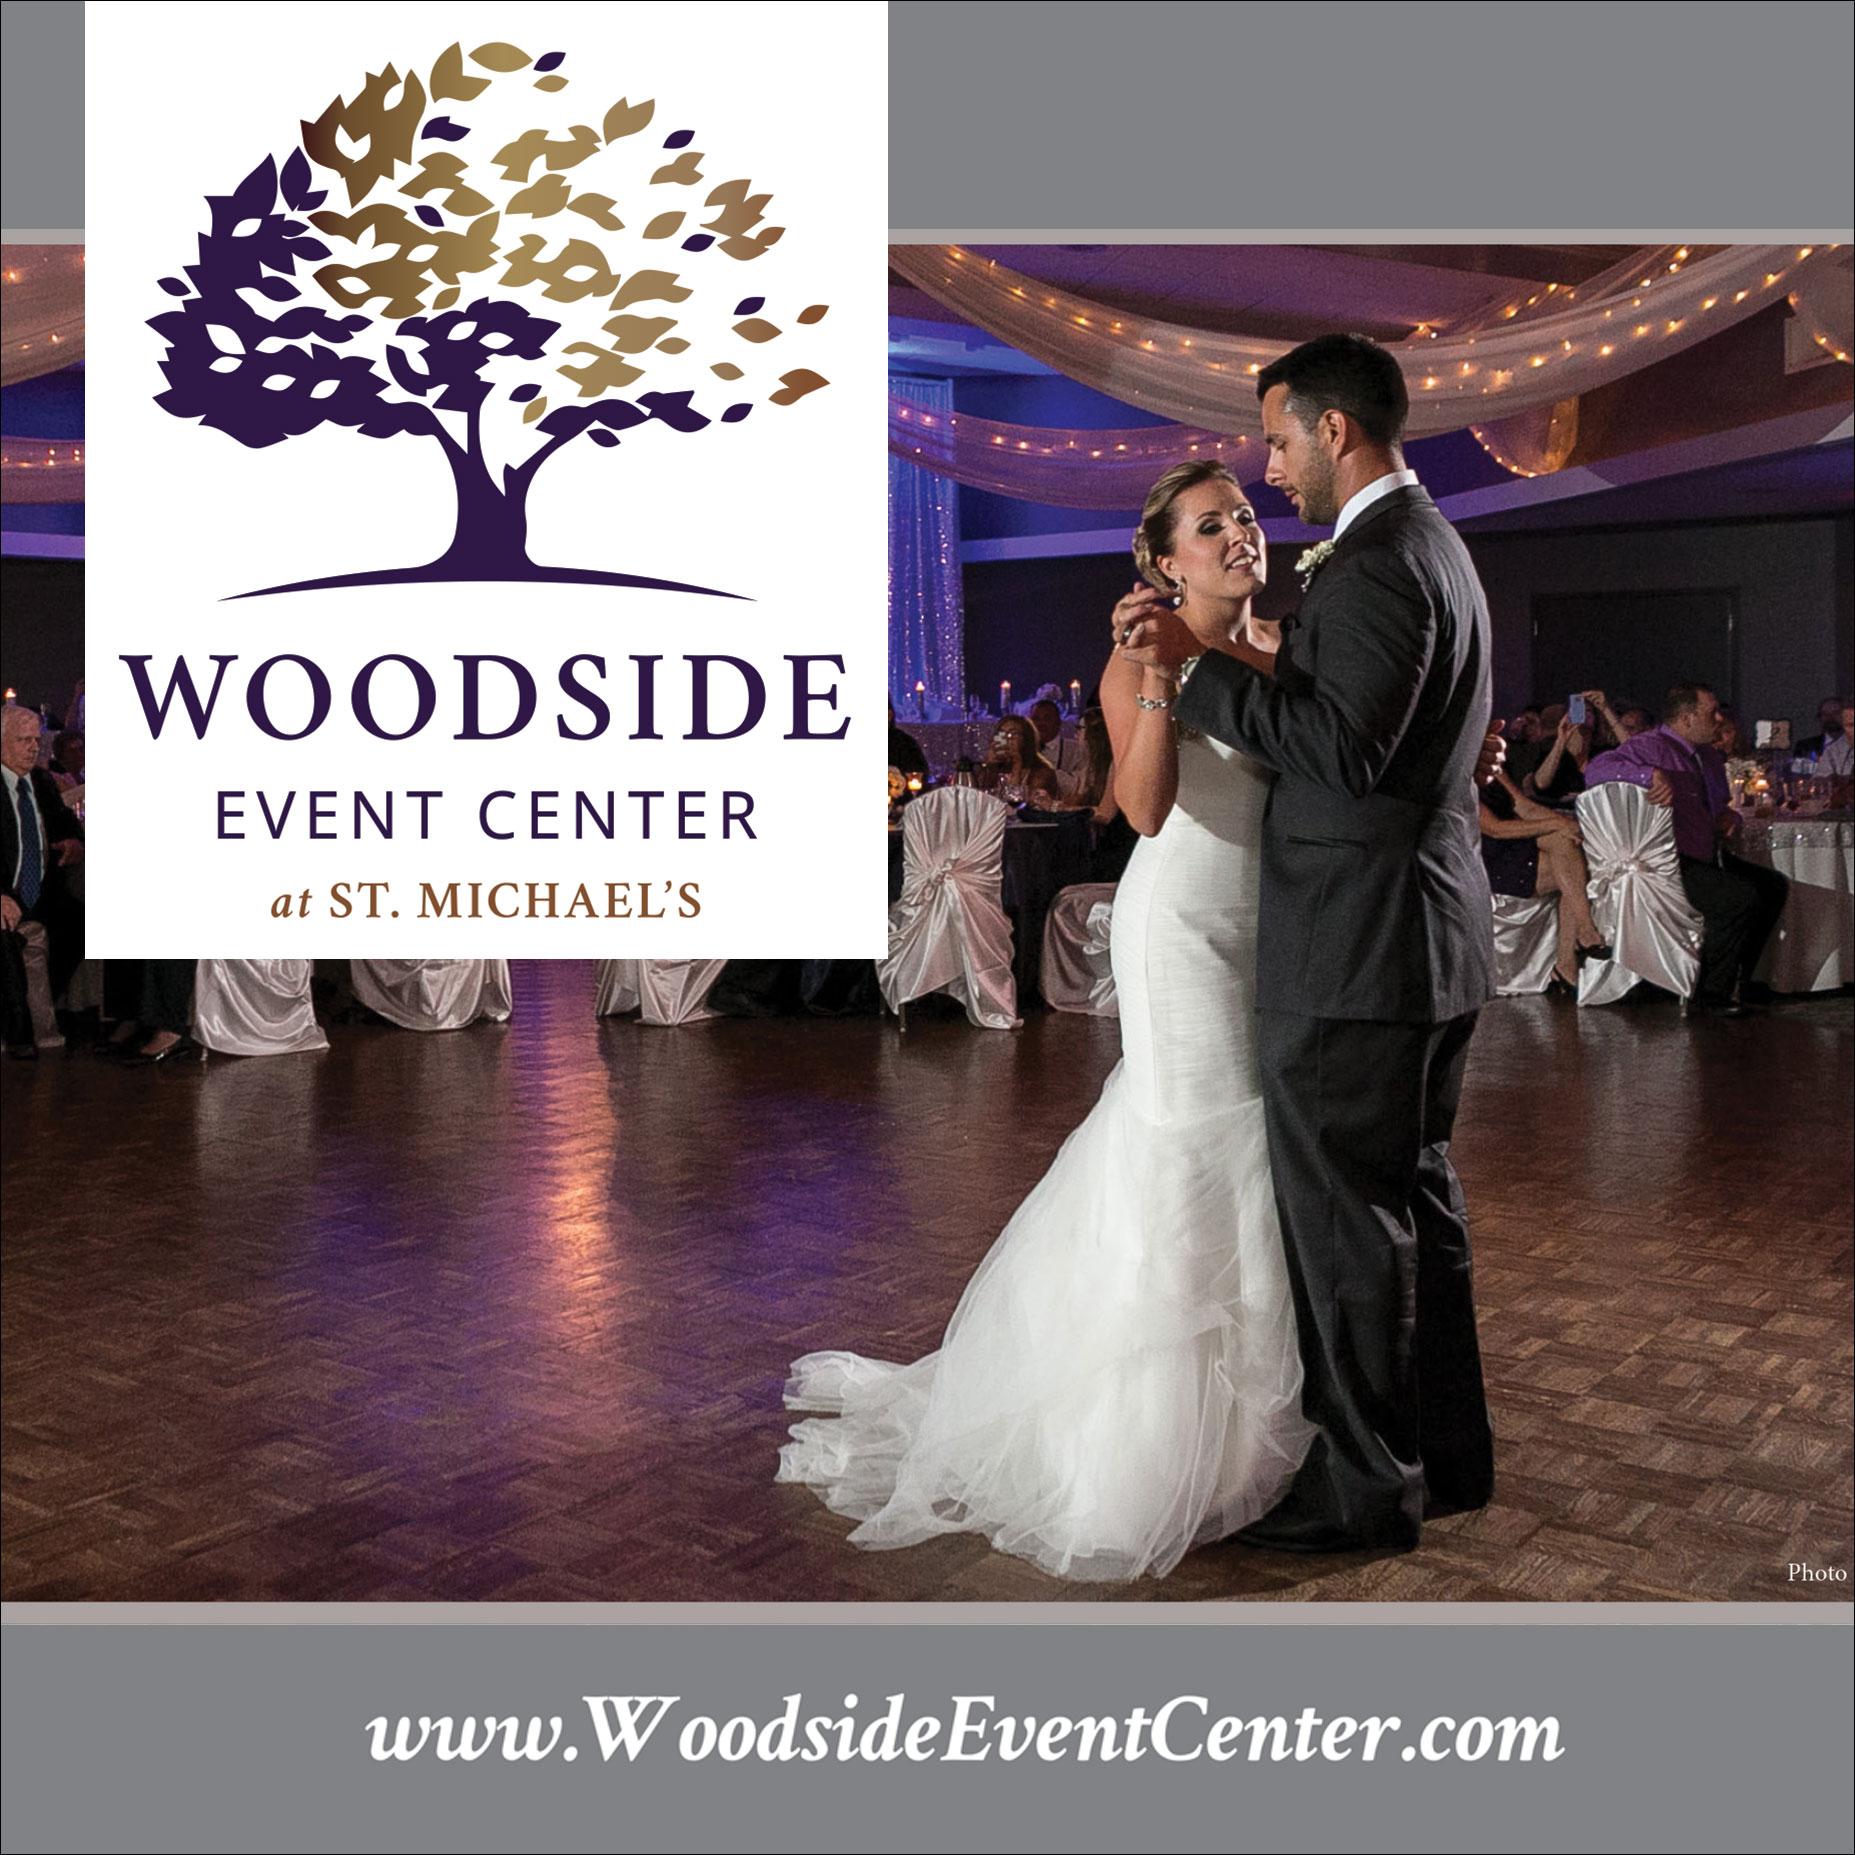 Woodside Event Center